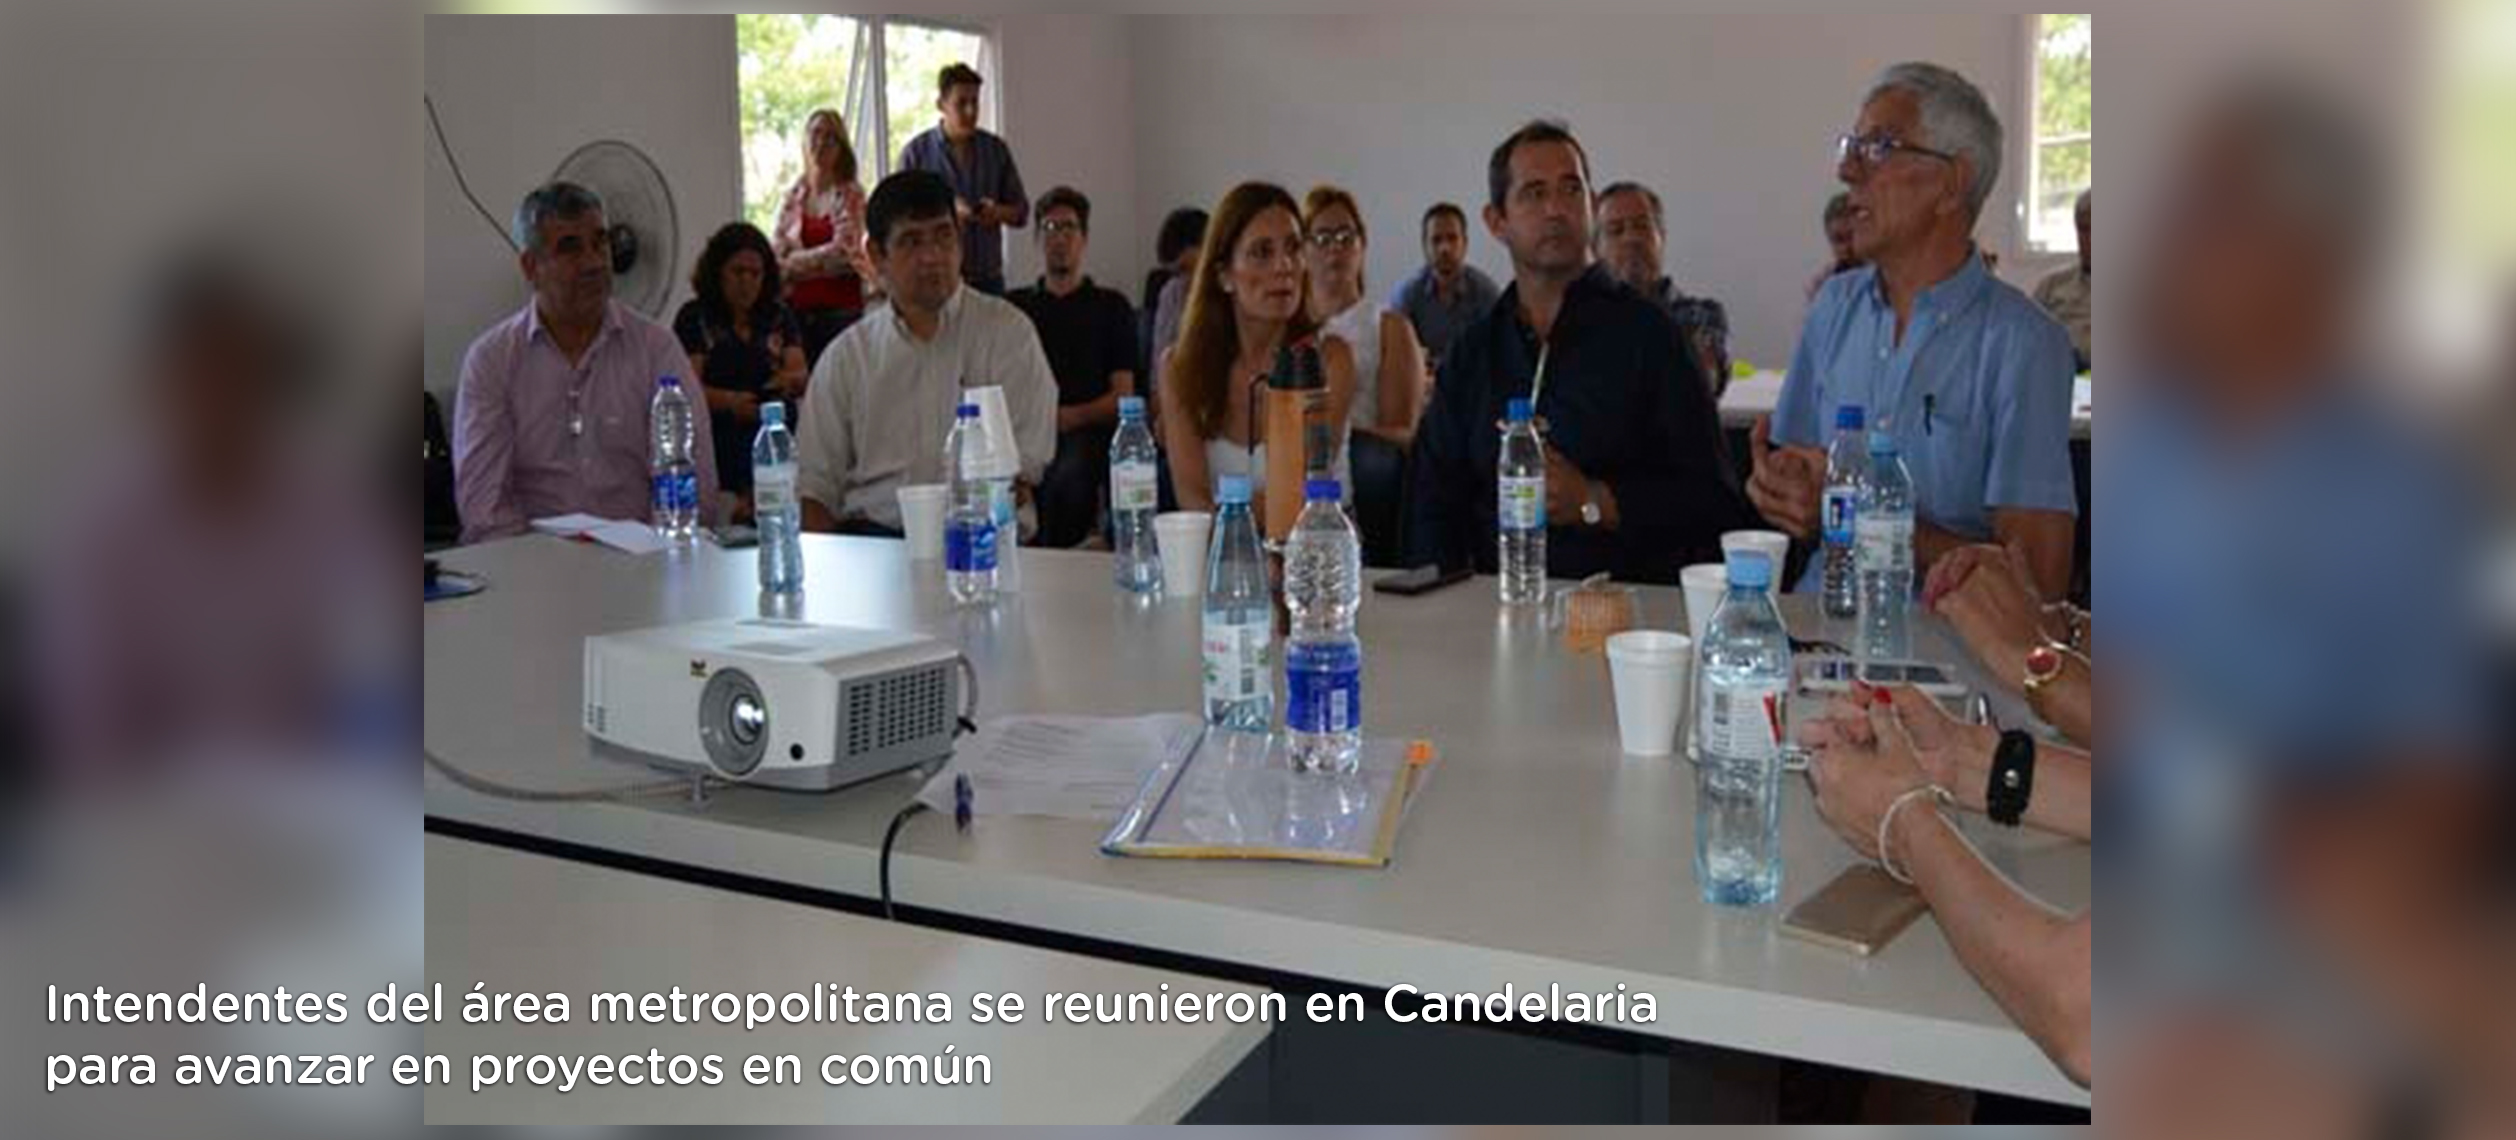 Intendentes del área metropolitana se reunieron en Candelaria para avanzar en proyectos en común 01